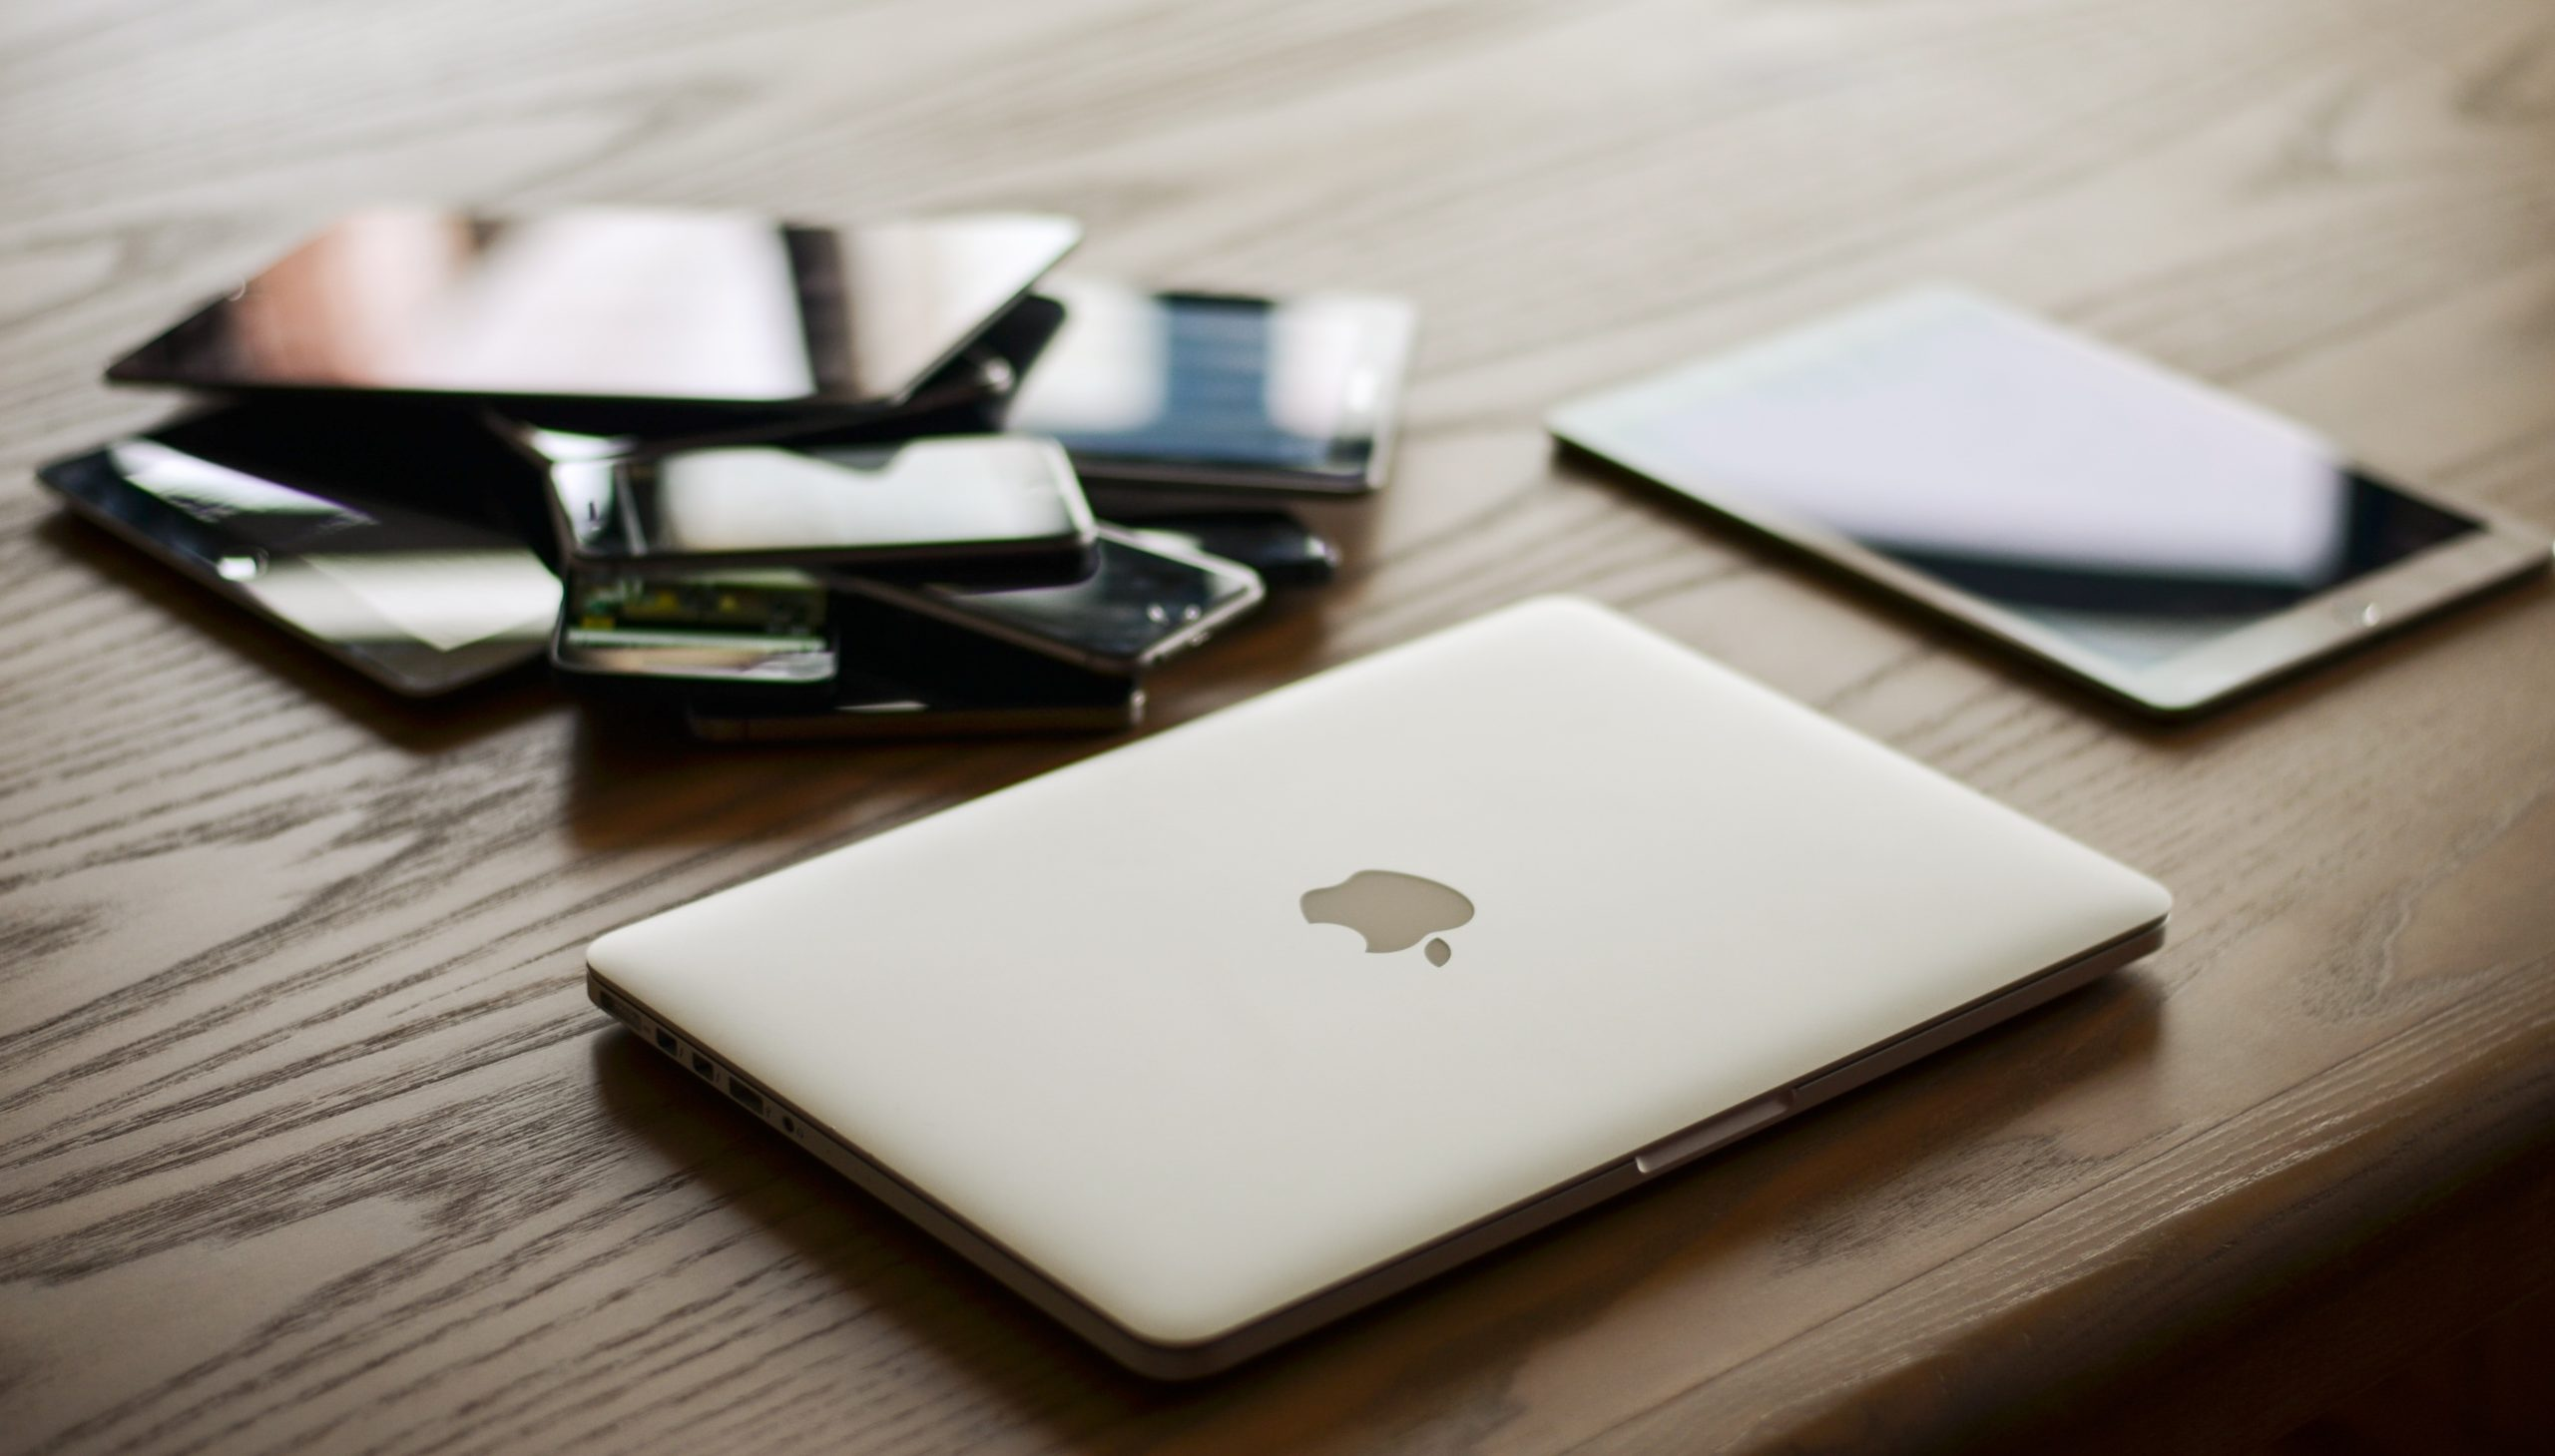 Hoe kun je verduurzamen op gadgets?